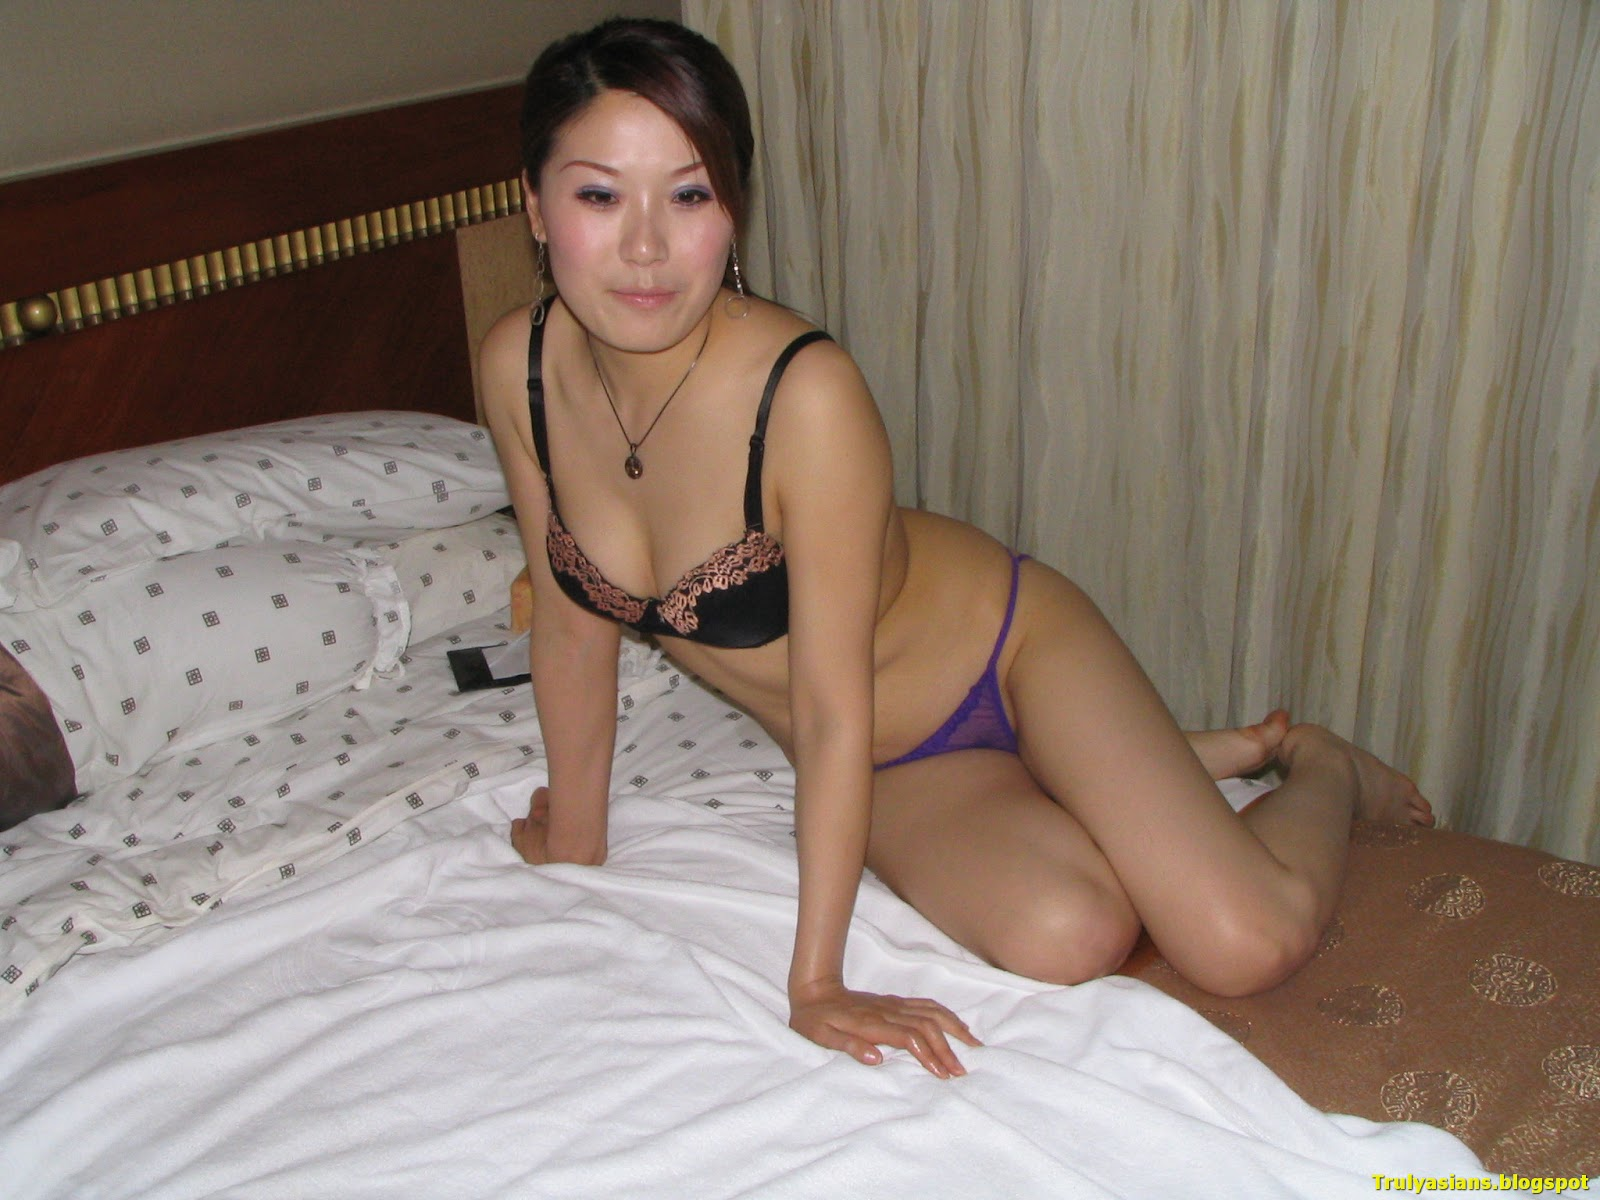 Damas que buscan encuentros eróticos